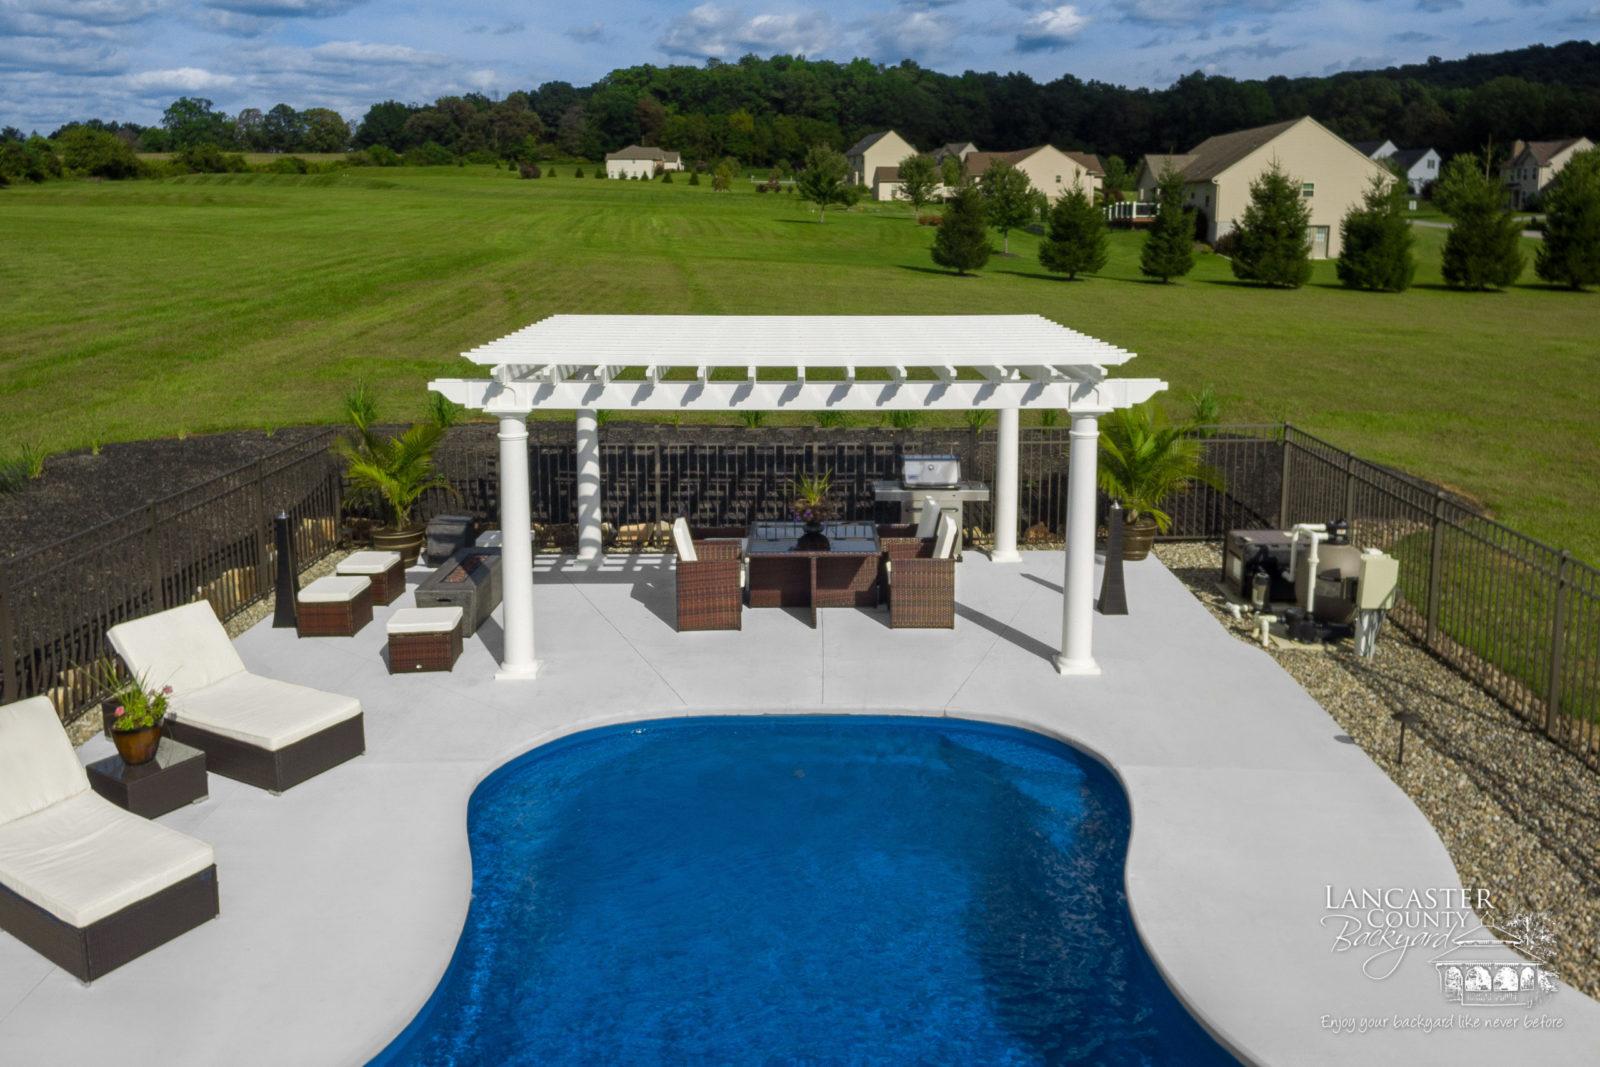 luxury poolside pergola for sale in mertztown pa